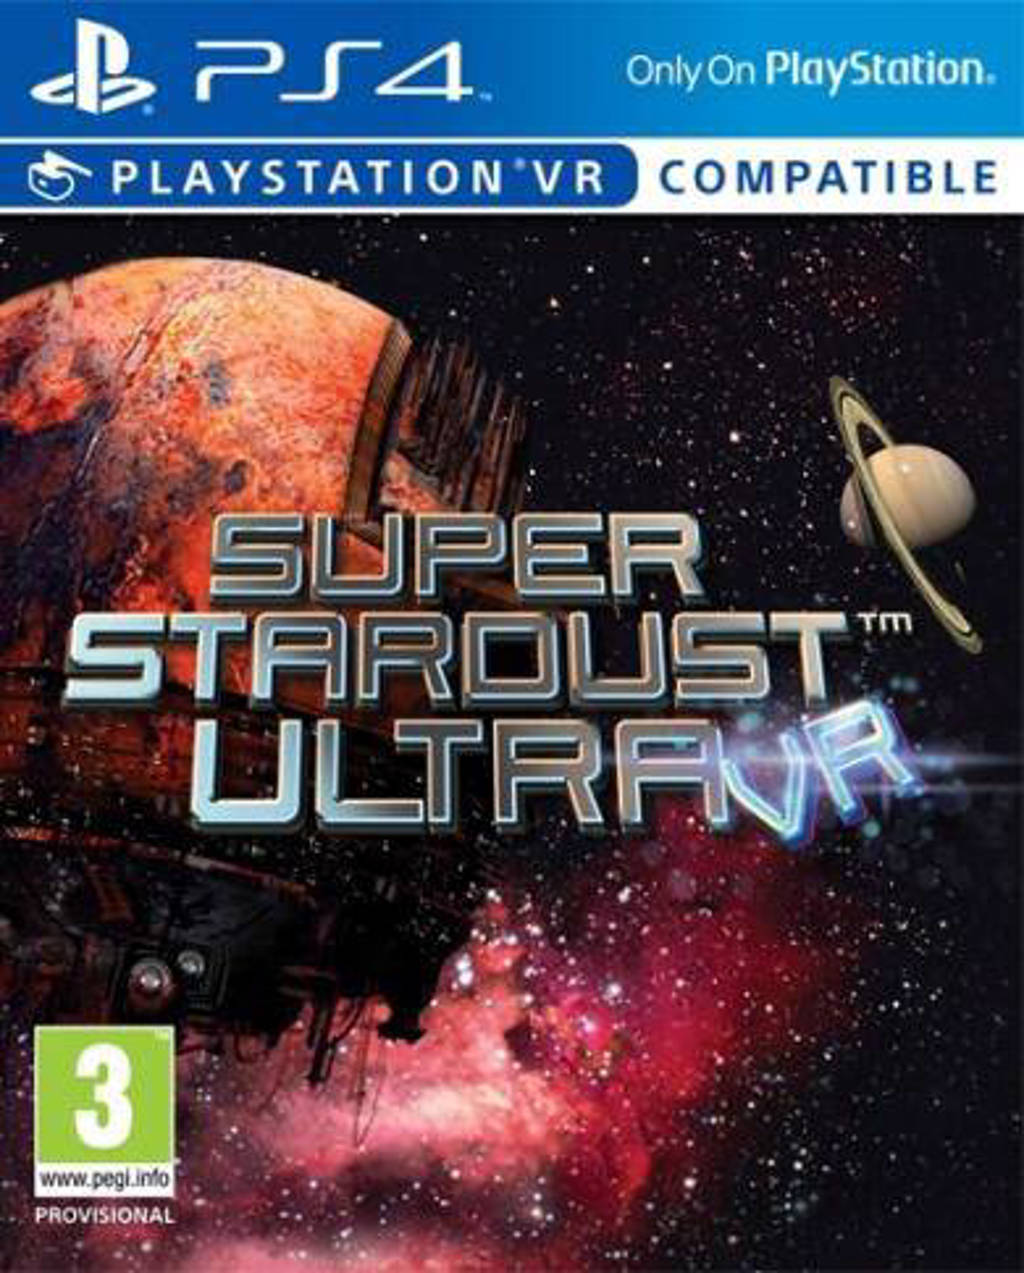 Super stardust ultra (VR) (PlayStation 4)